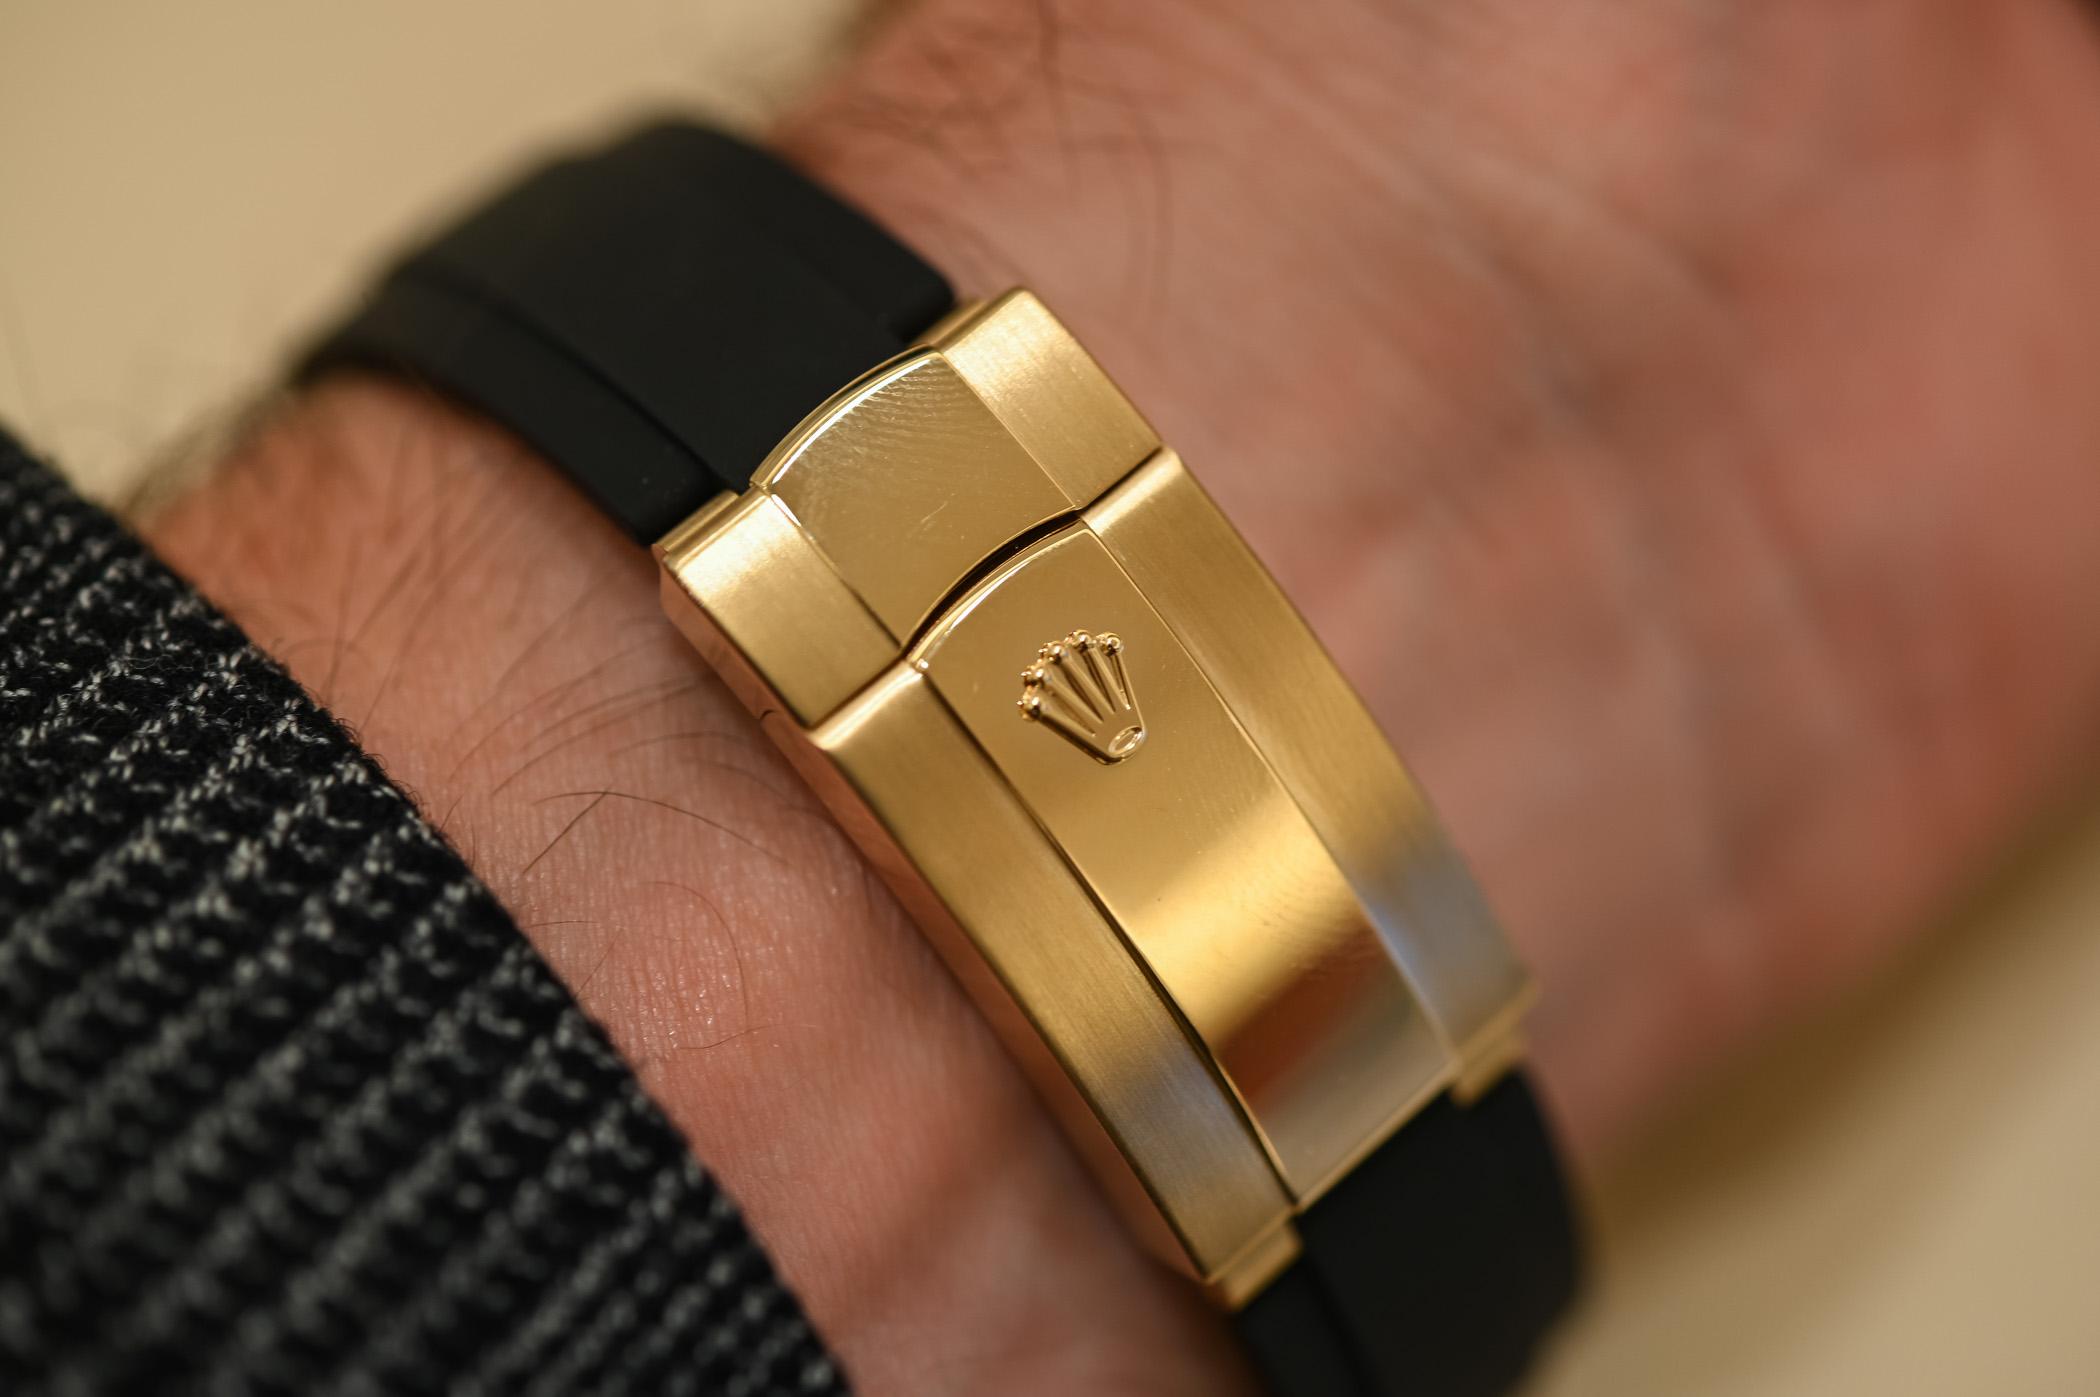 Rolex Sky-Dweller Oysterflex Bracelet Yellow Gold Black Dial 326238 - 4